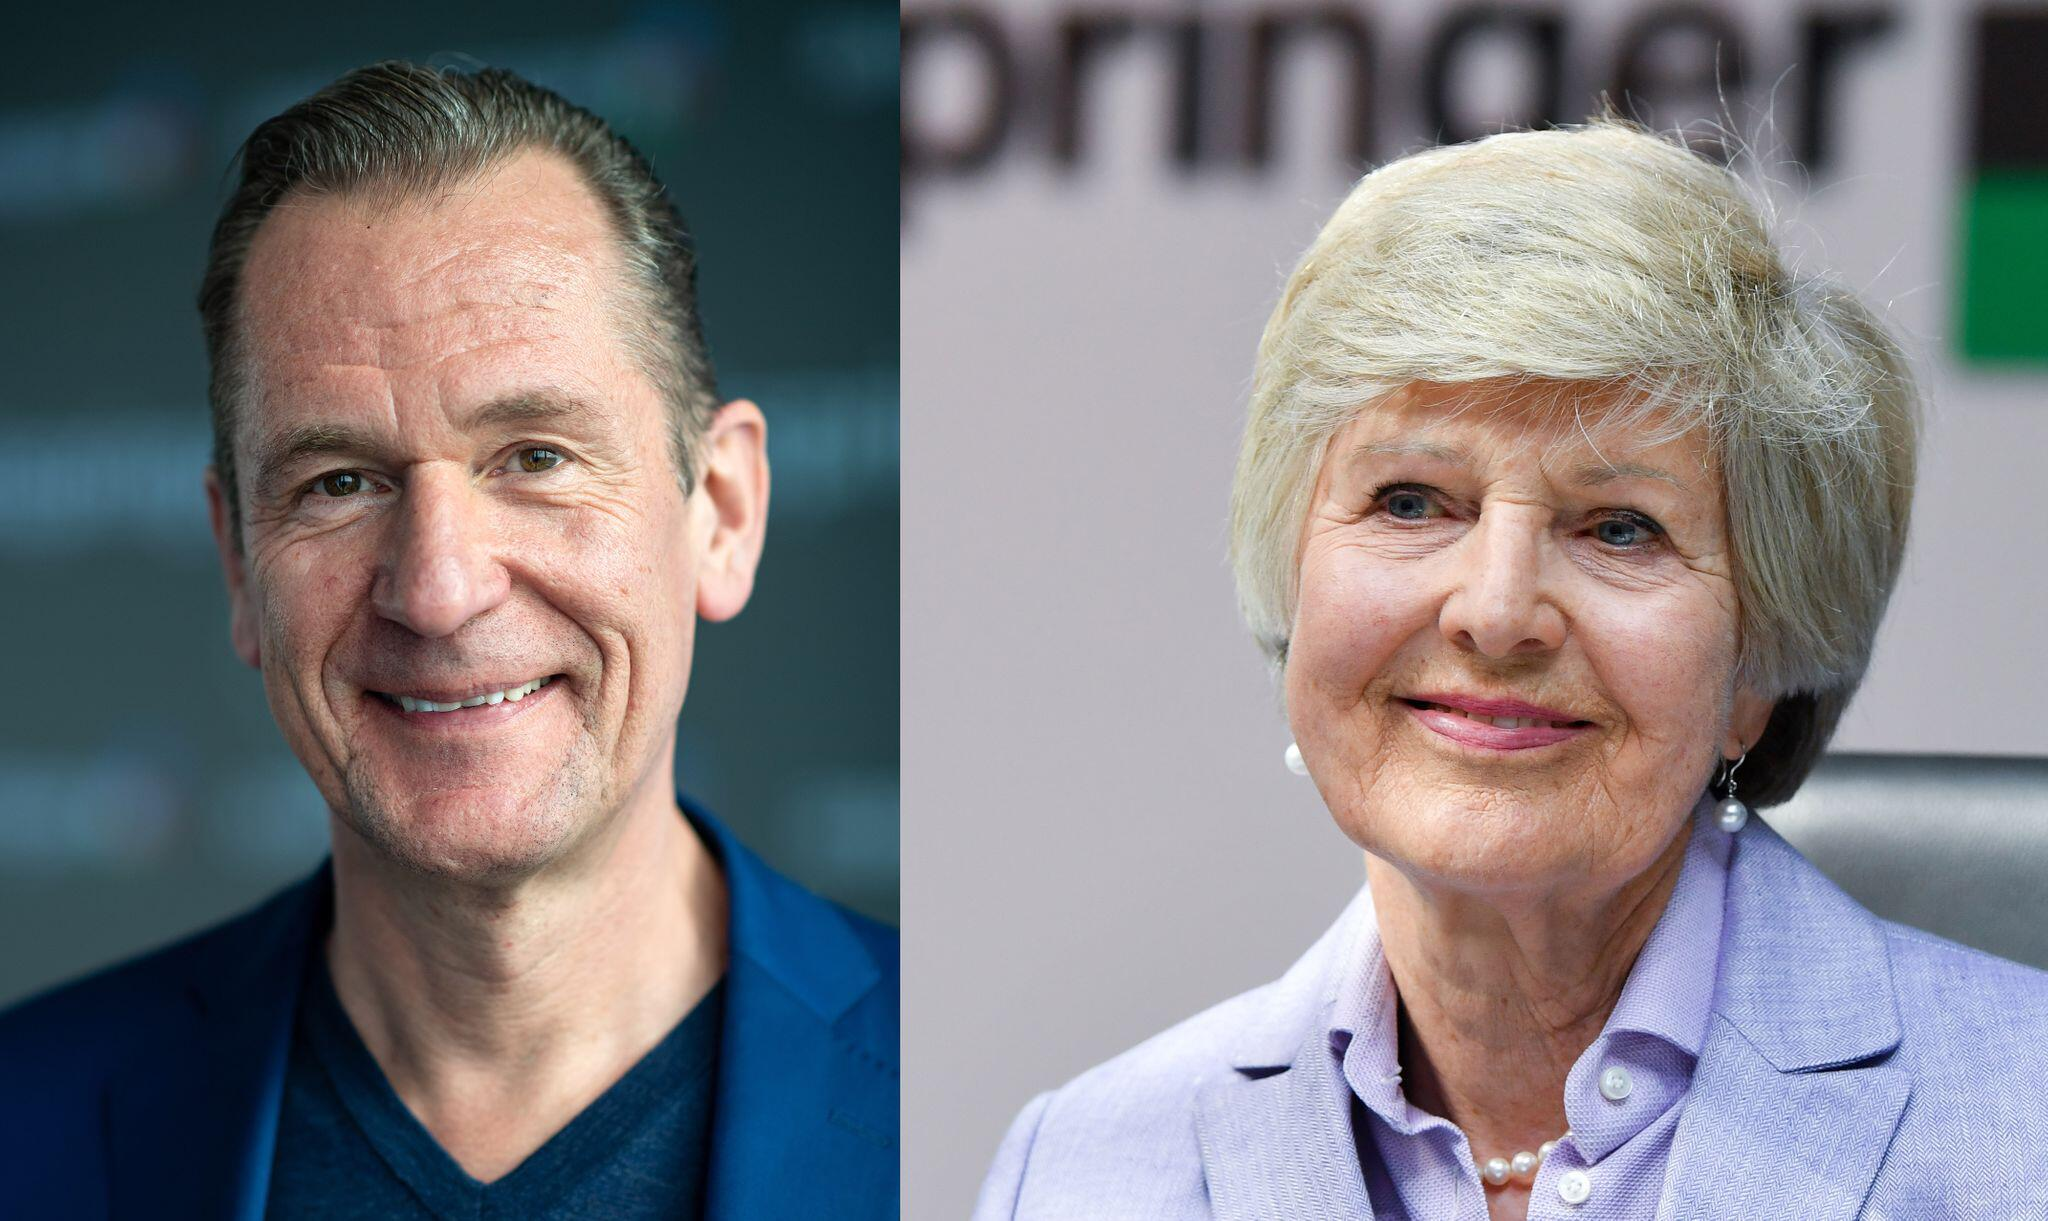 Axel Springer: Friede Springer benennt Döpfner als Nachfolger